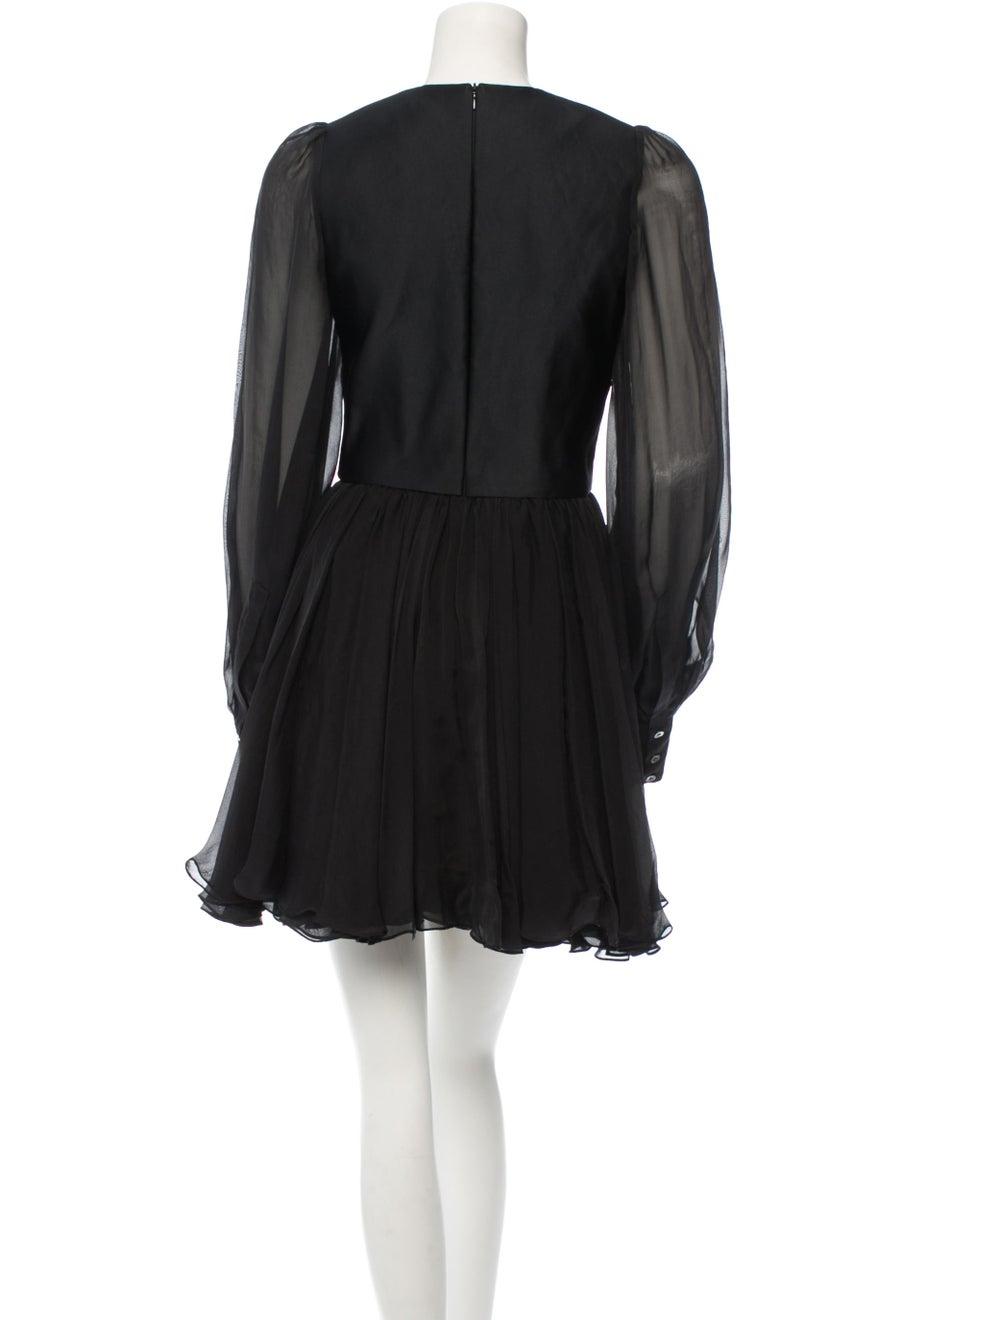 Plein Sud Silk Dress Black - image 3